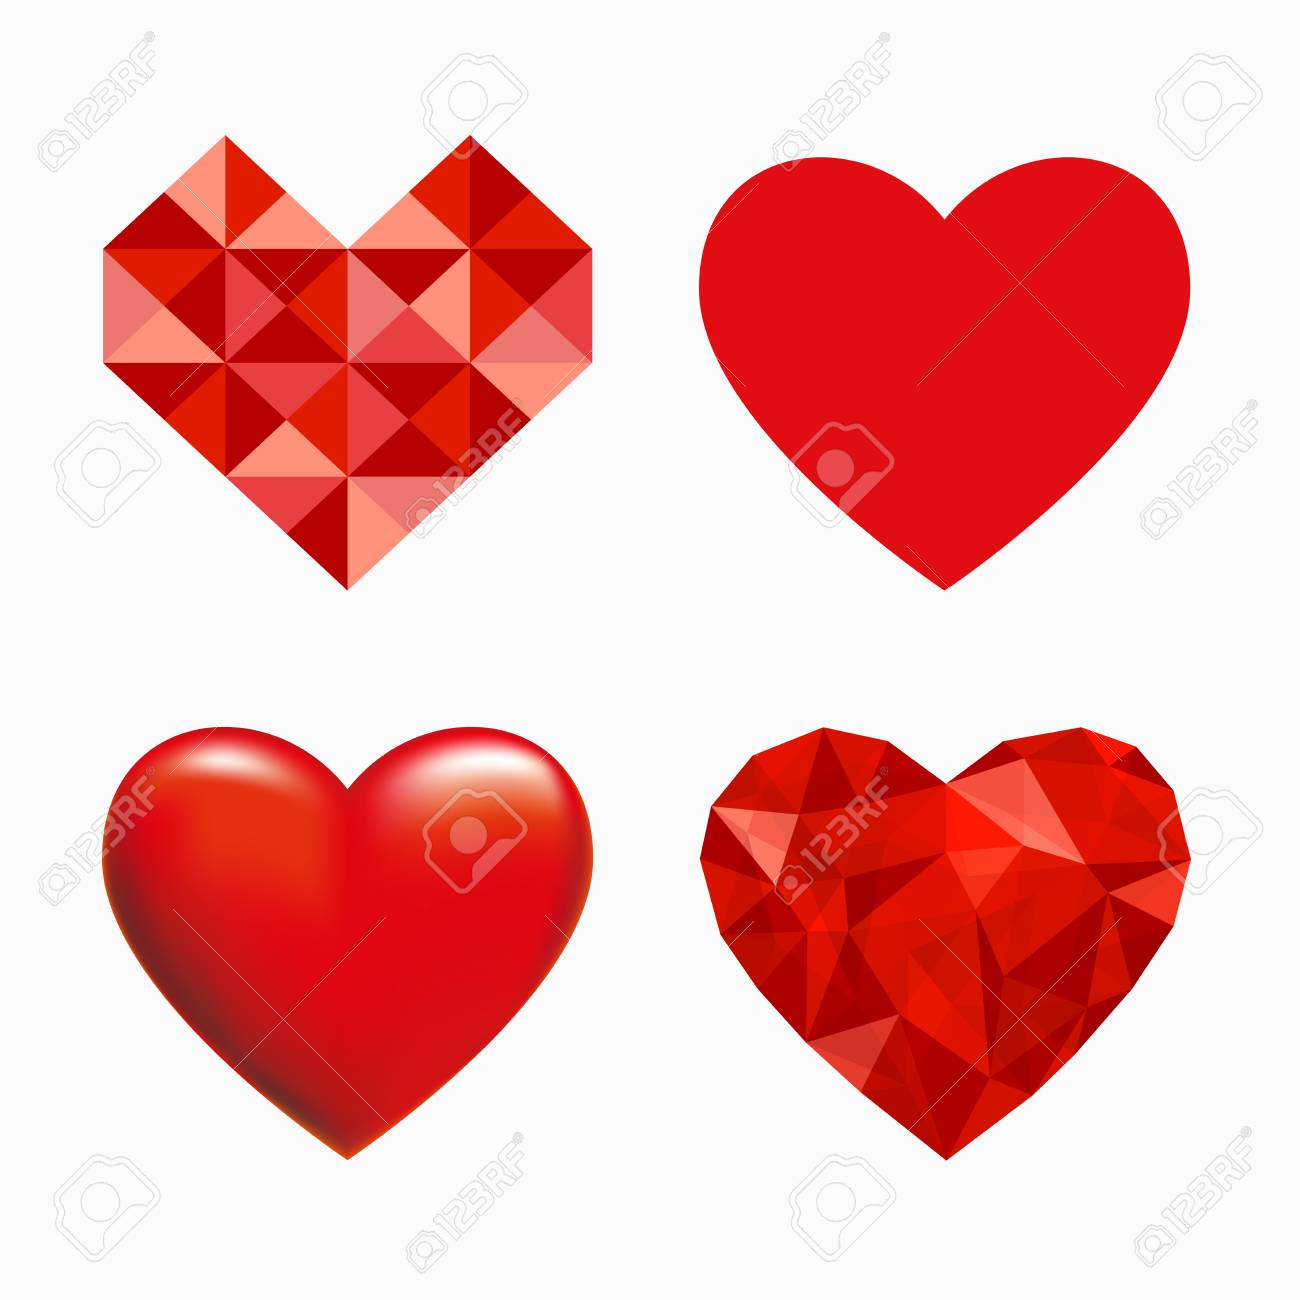 Heart symbols royalty free cliparts vectors and stock heart symbols stock vector 76489599 buycottarizona Image collections